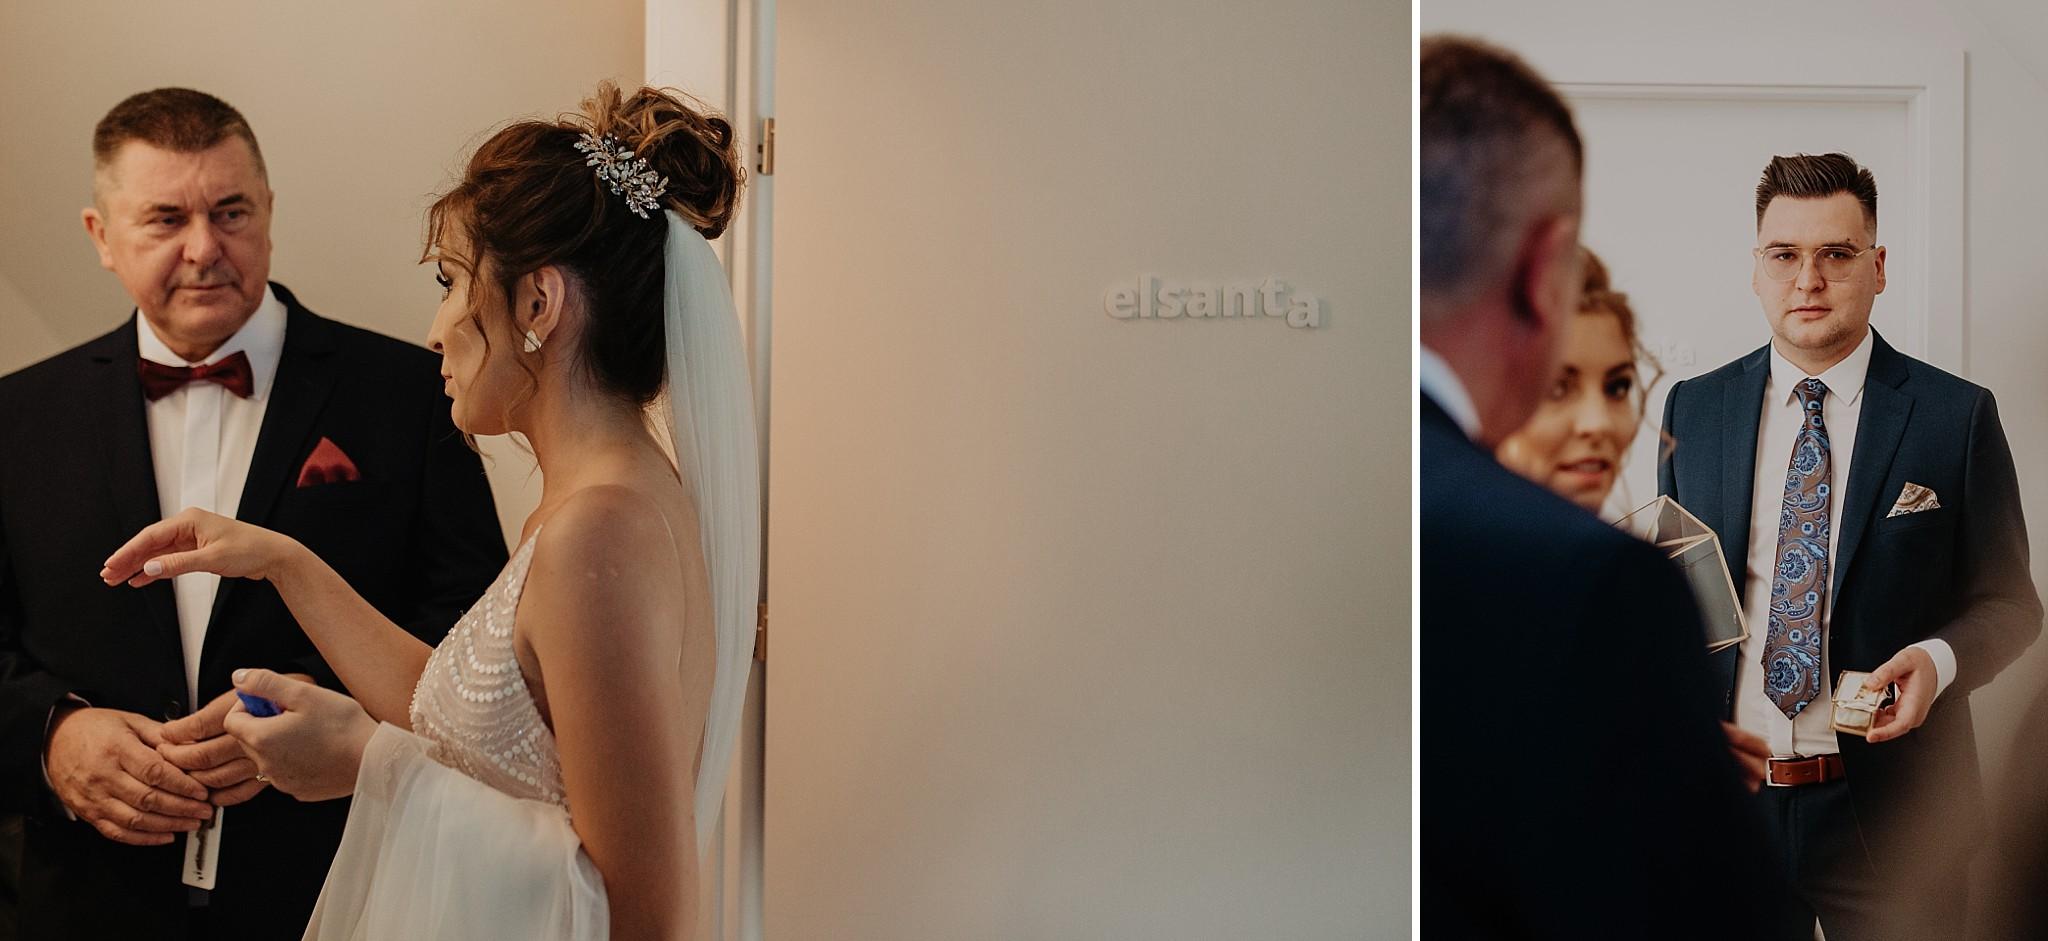 fotograf poznan wesele dobra truskawka piekne wesele pod poznaniem wesele w dobrej truskawce piekna para mloda slub marzen slub koronawirus slub listopad wesele koronawirus 080